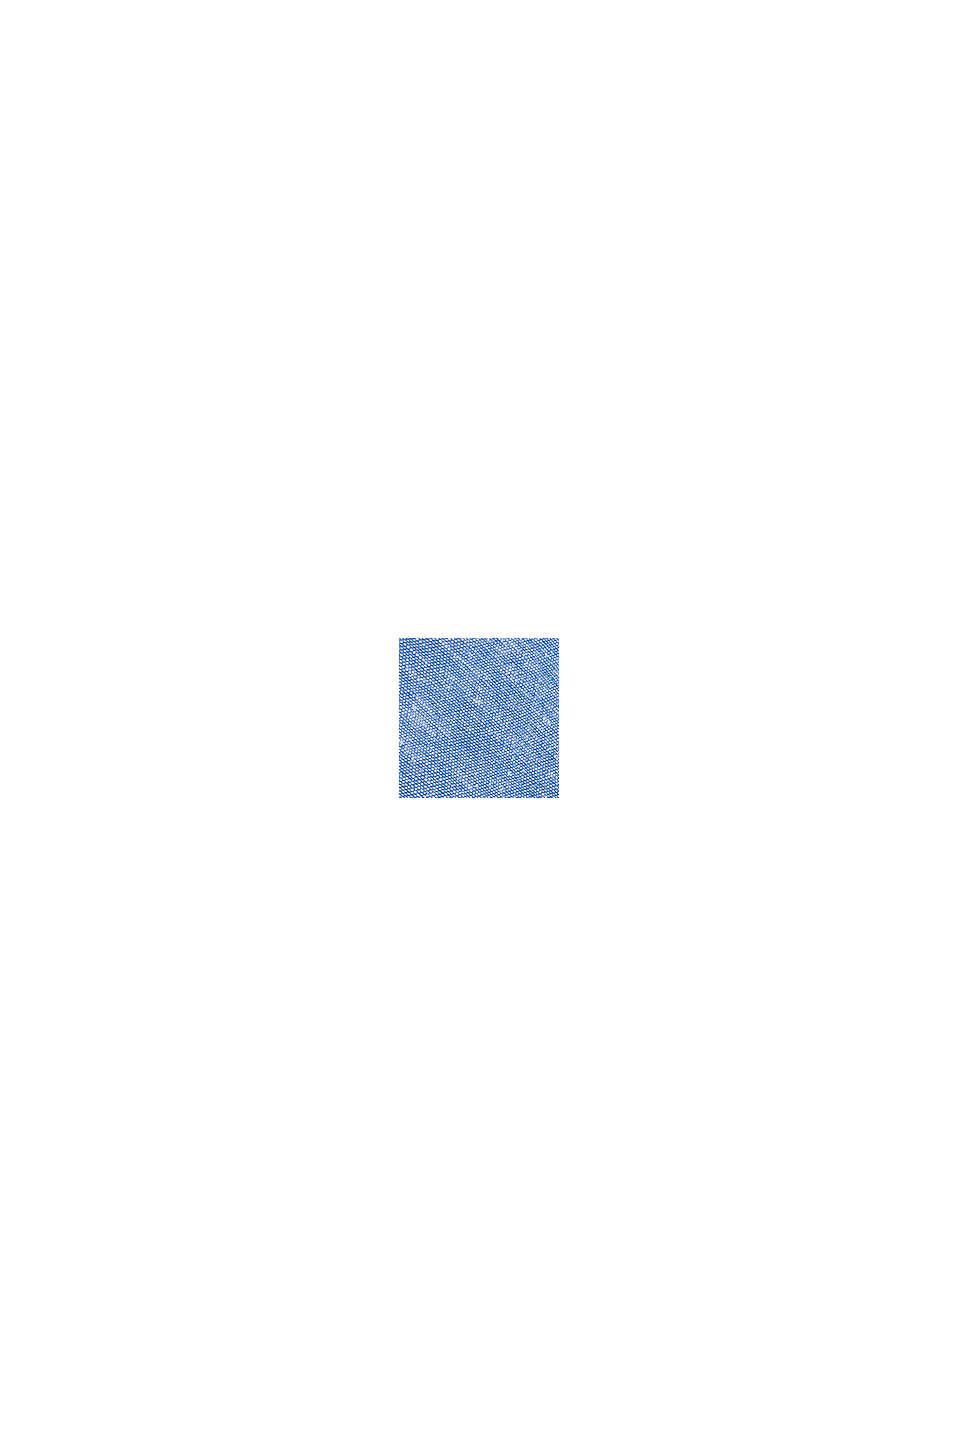 Mit Leinen: Kurzarm-Hemd, LIGHT BLUE, swatch